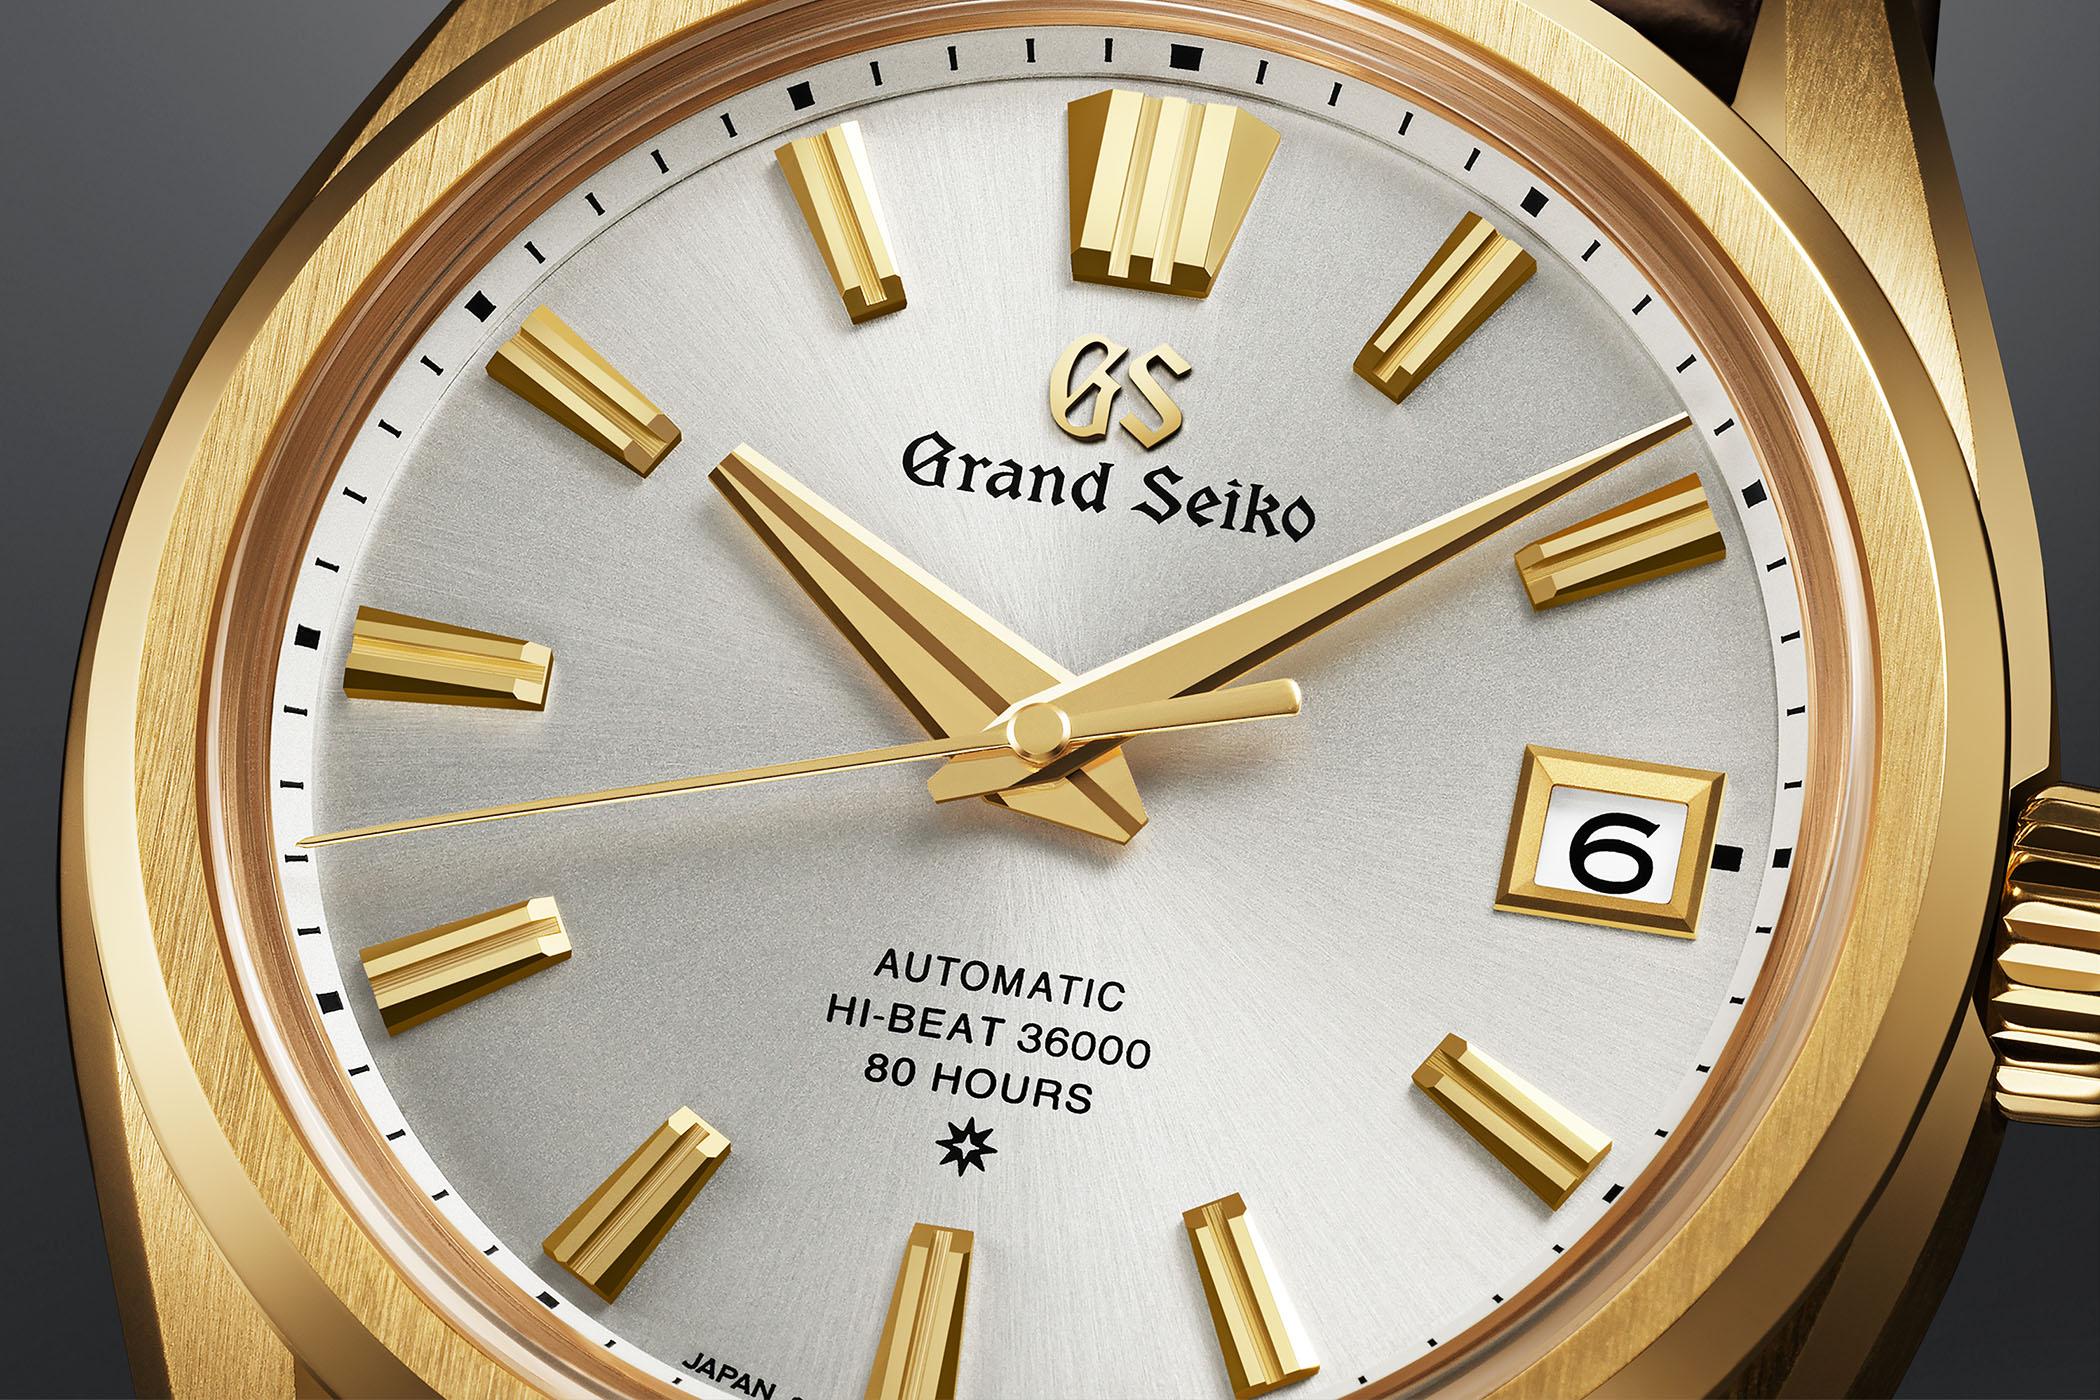 Grand Seiko 60th Anniversary SLGH002 Hi-Beat Calibre 9SA5 Dual Impulse Escapement